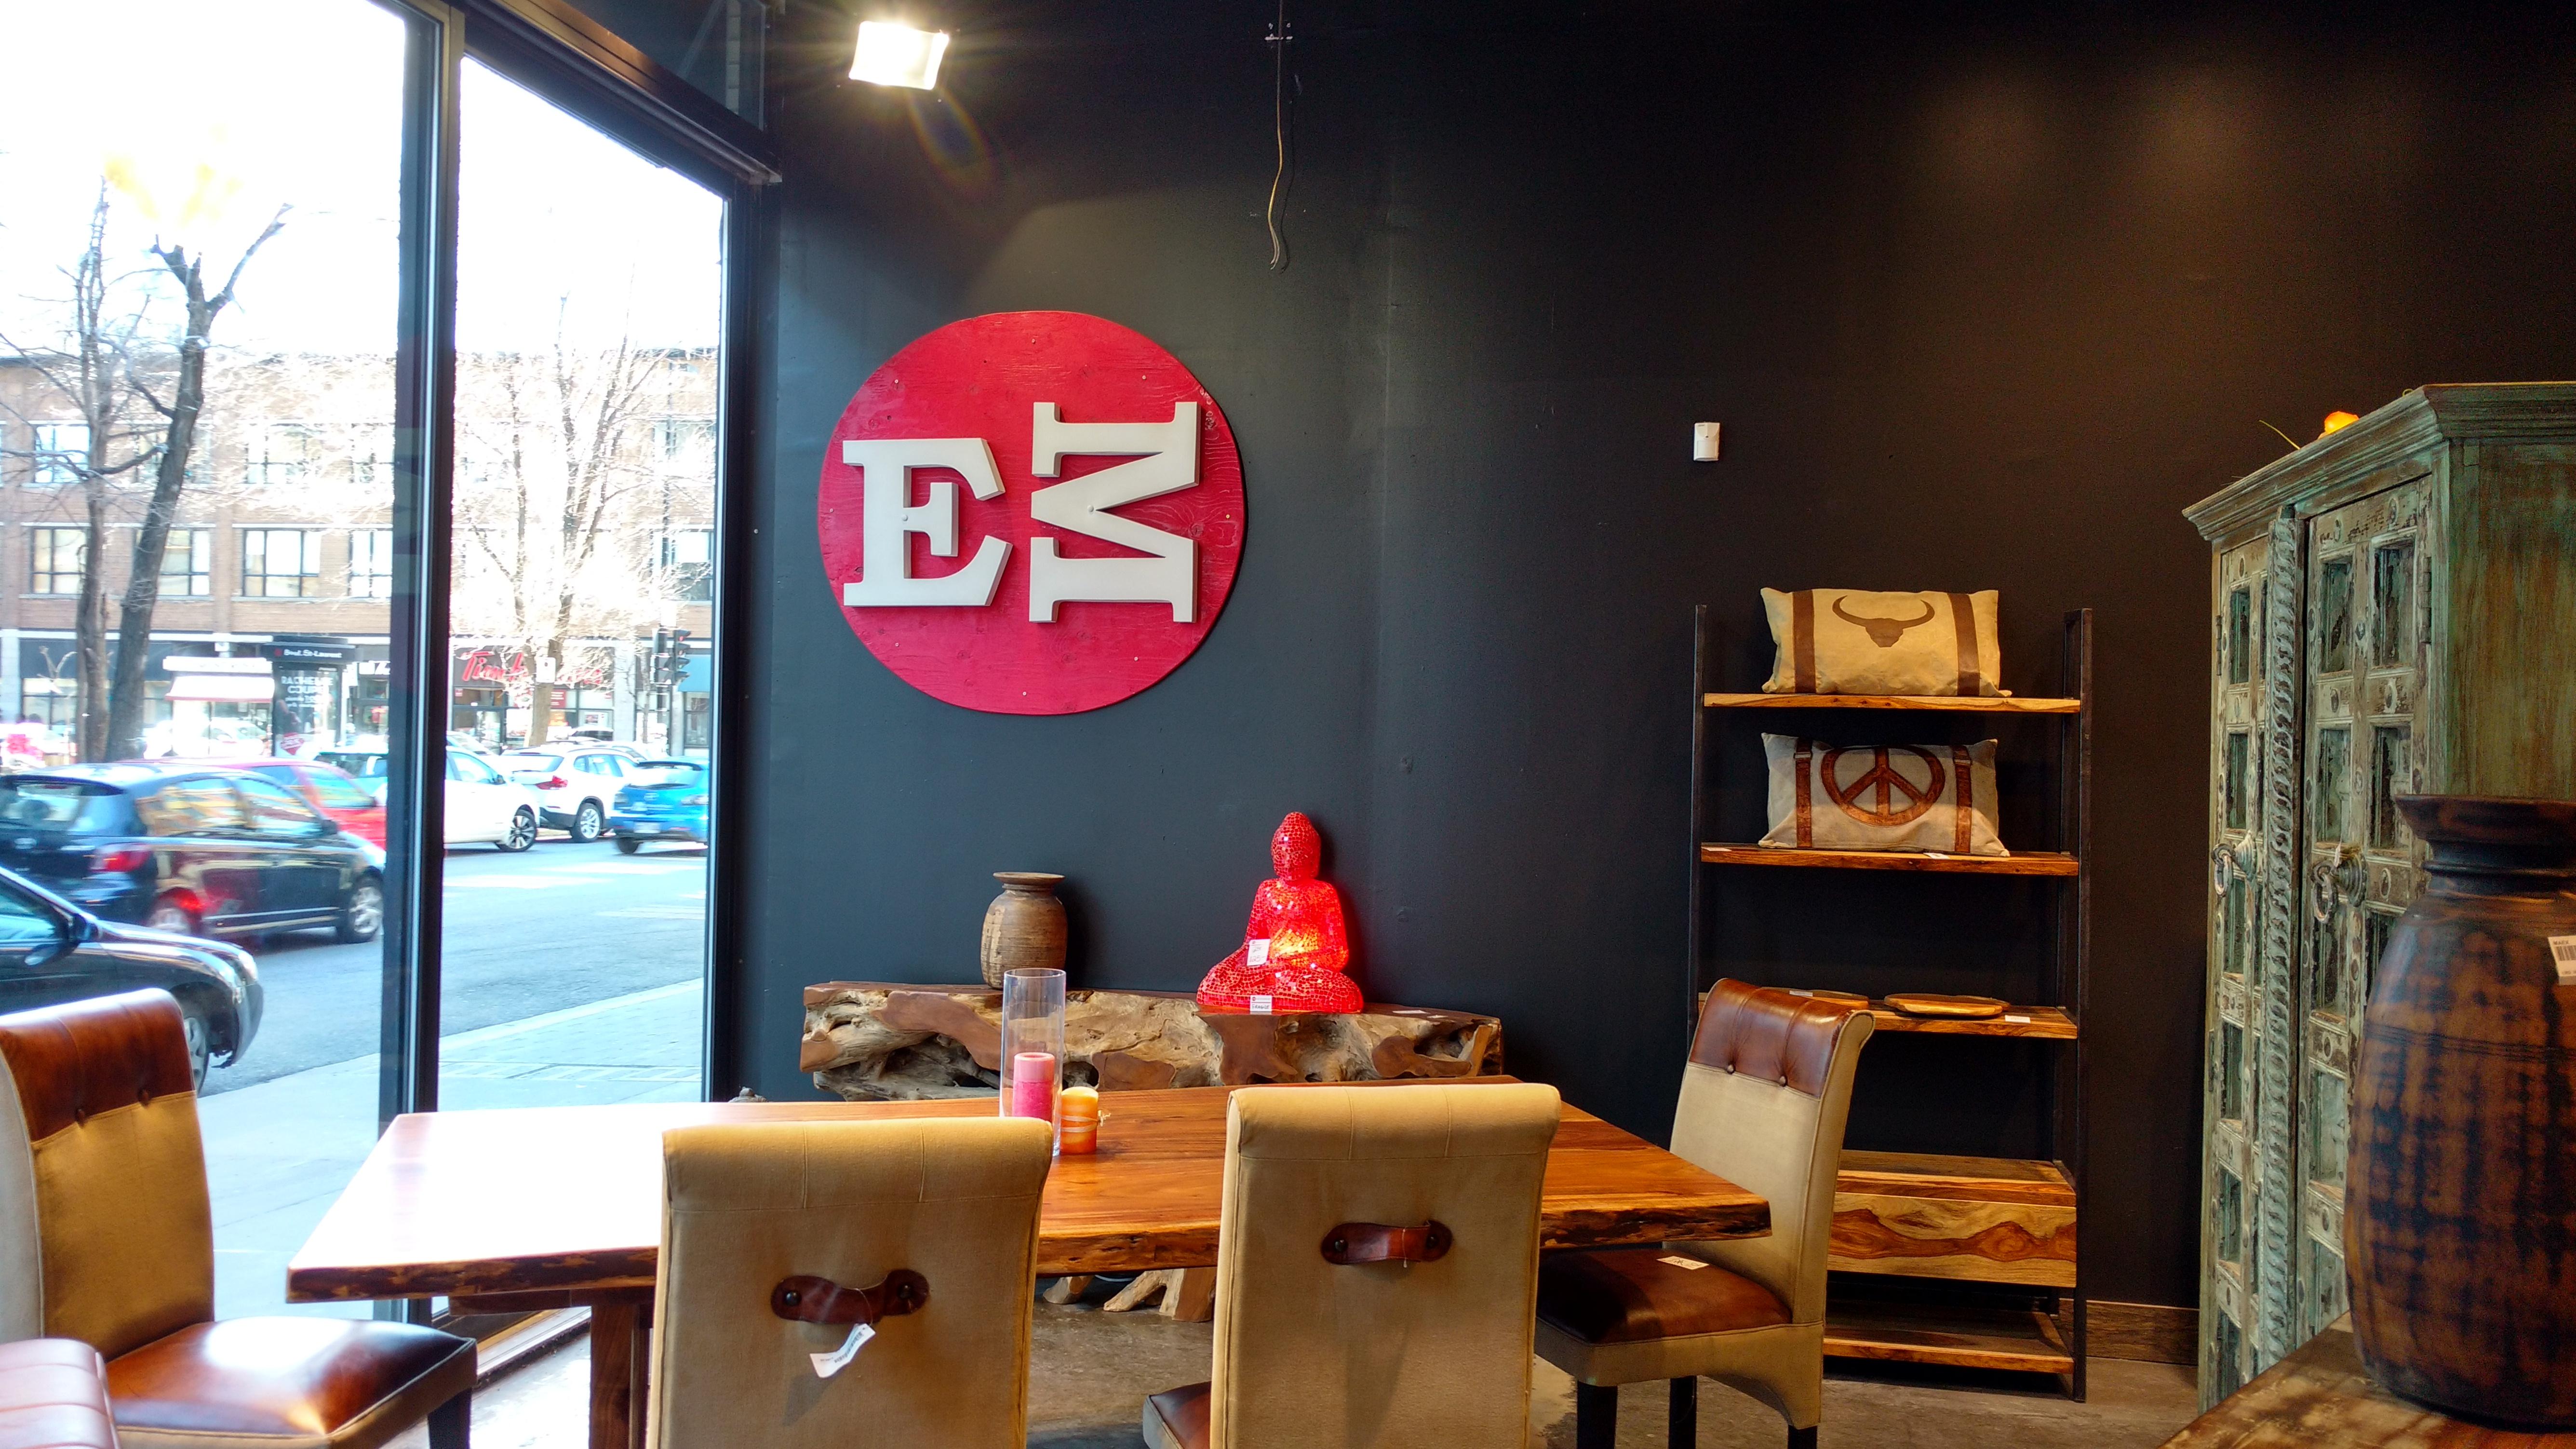 Exotik mobilier sdbsl boulevard saint laurent for O miroir montreal